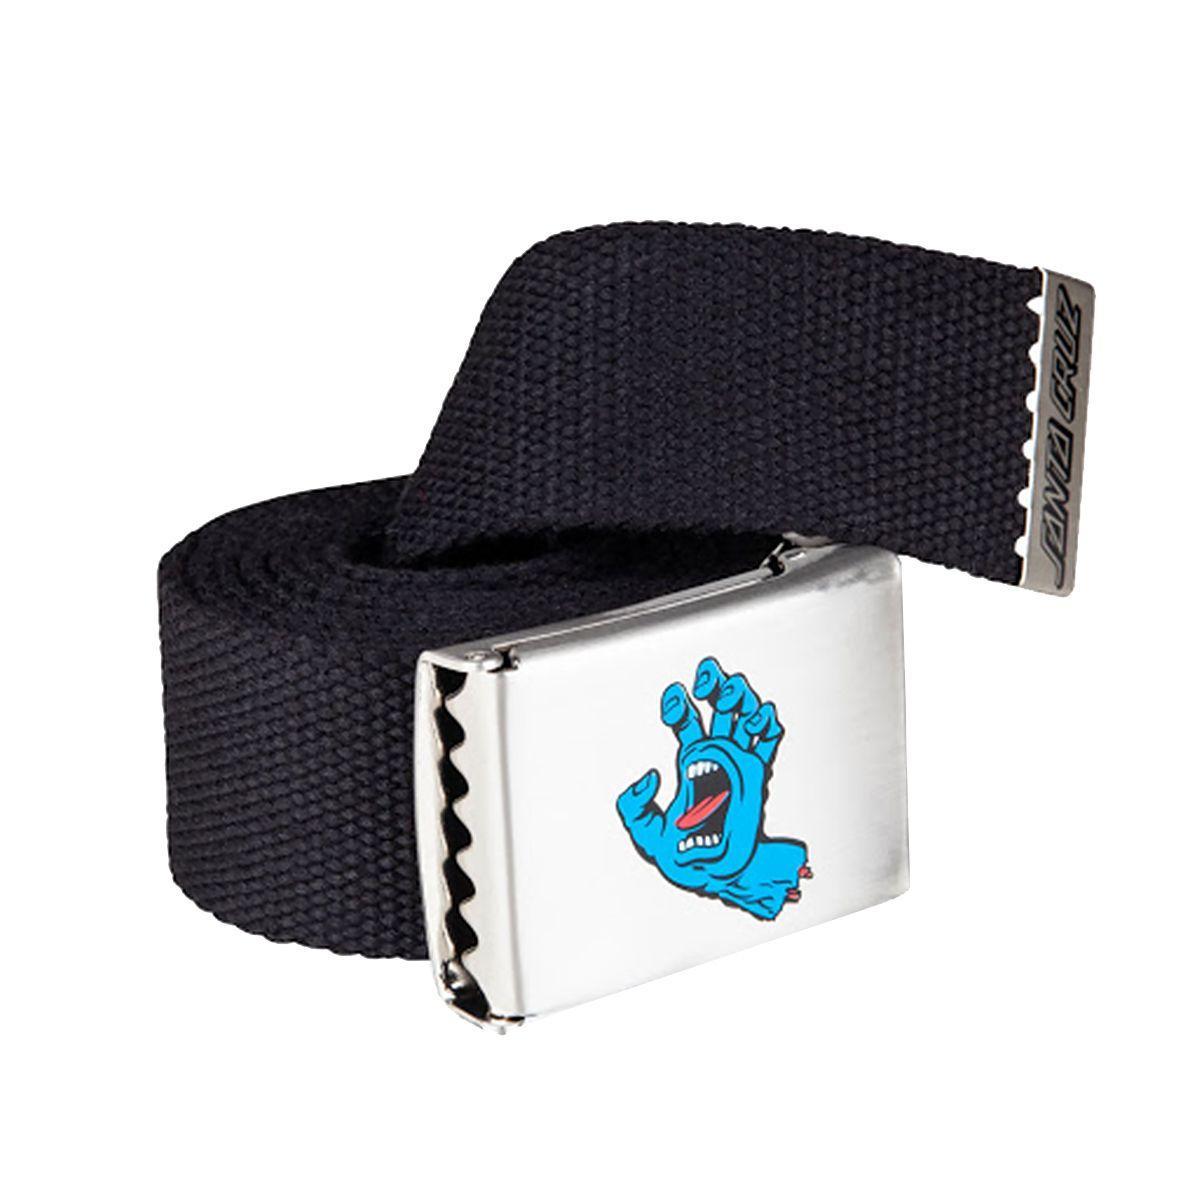 Scream Belt Buckle